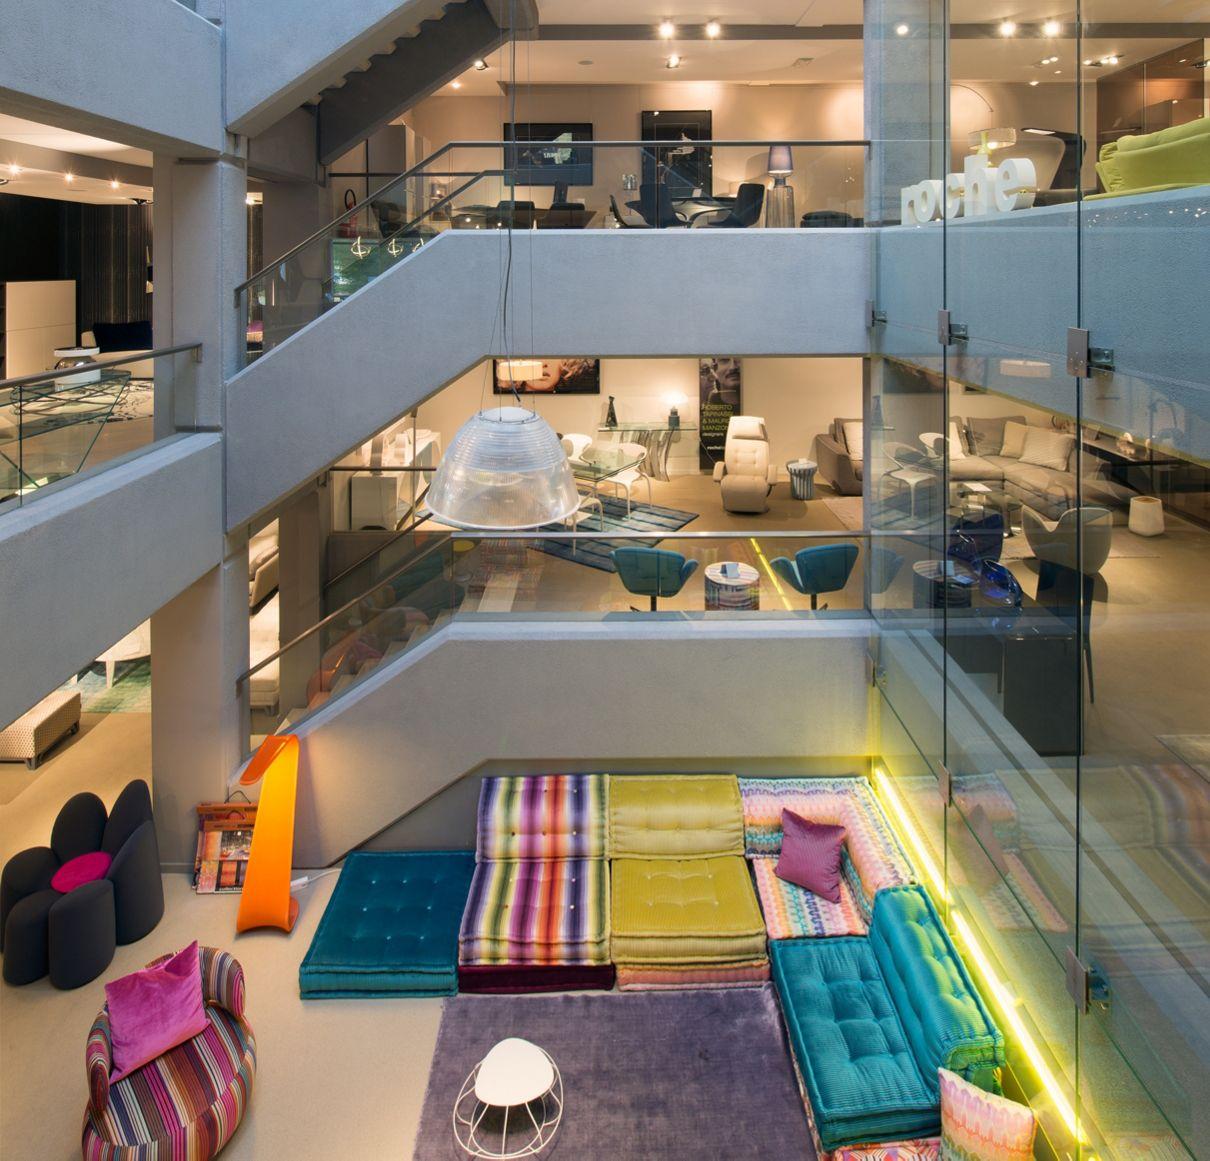 magasin roche bobois bruxelles uccle 1180. Black Bedroom Furniture Sets. Home Design Ideas